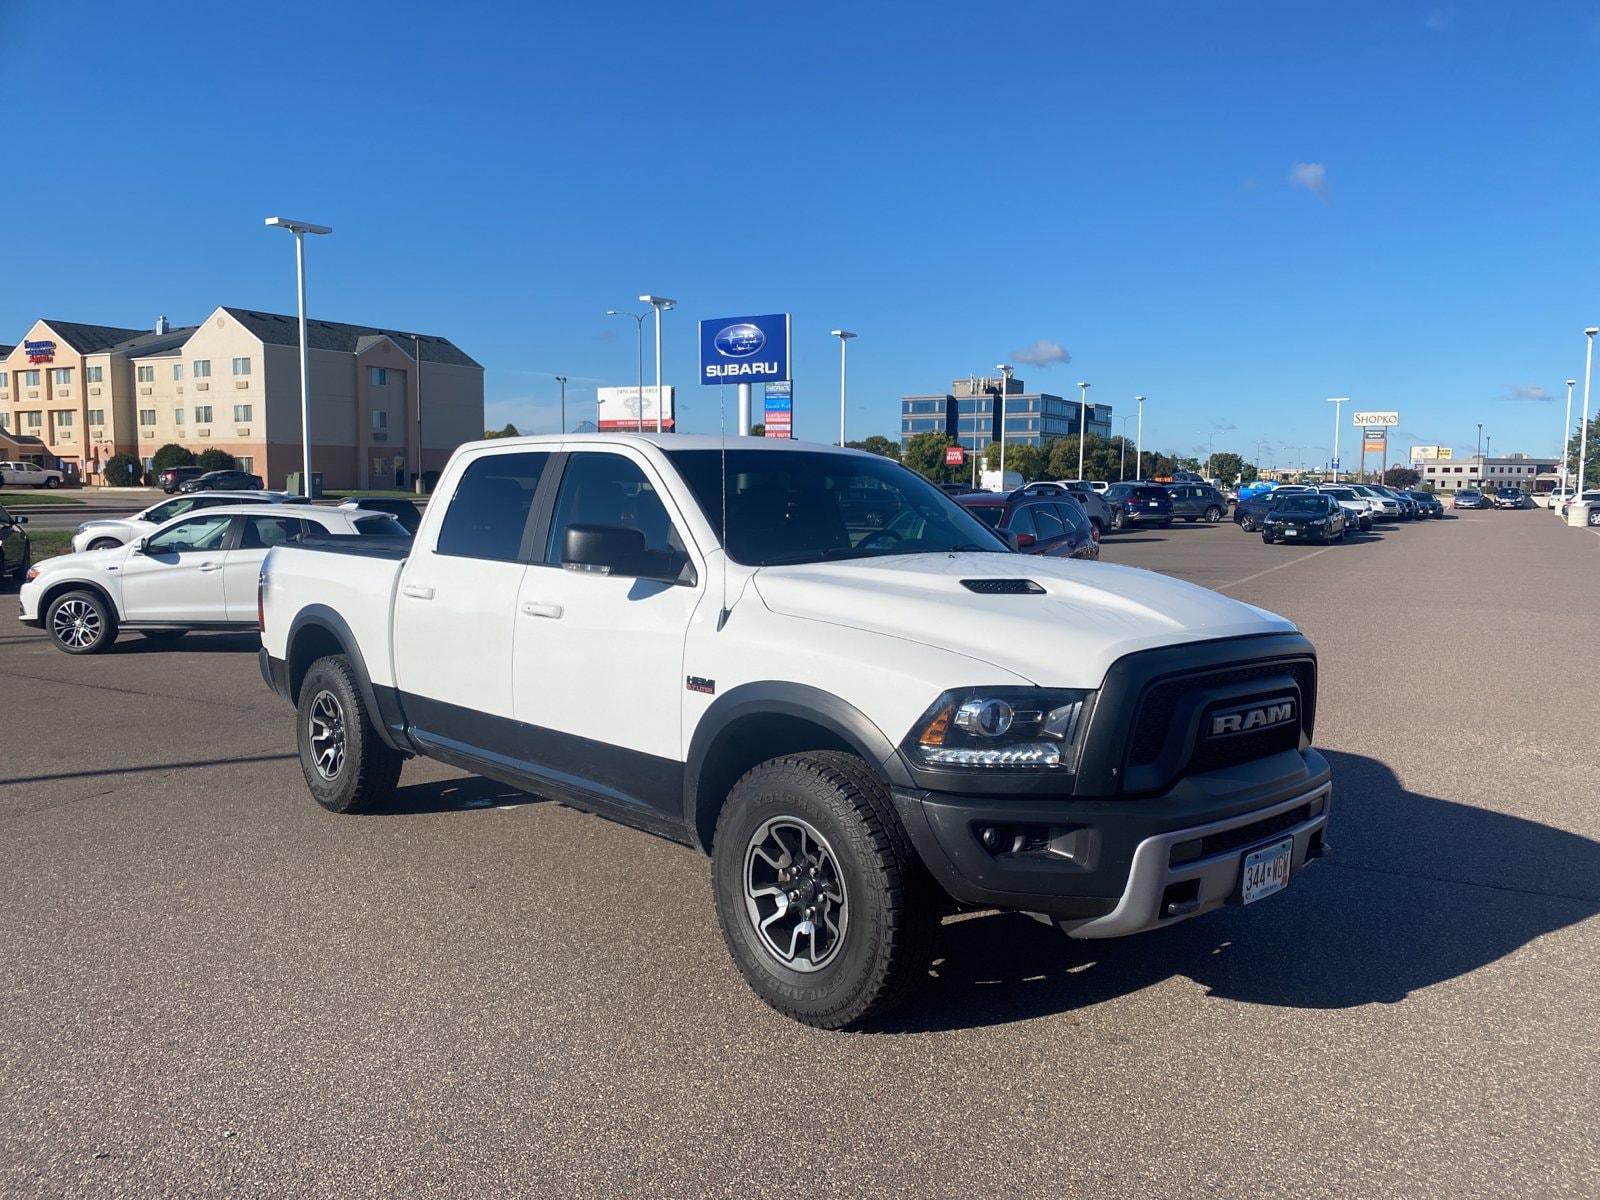 Used 2017 RAM Ram 1500 Pickup Rebel with VIN 1C6RR7YTXHS601377 for sale in Saint Cloud, Minnesota